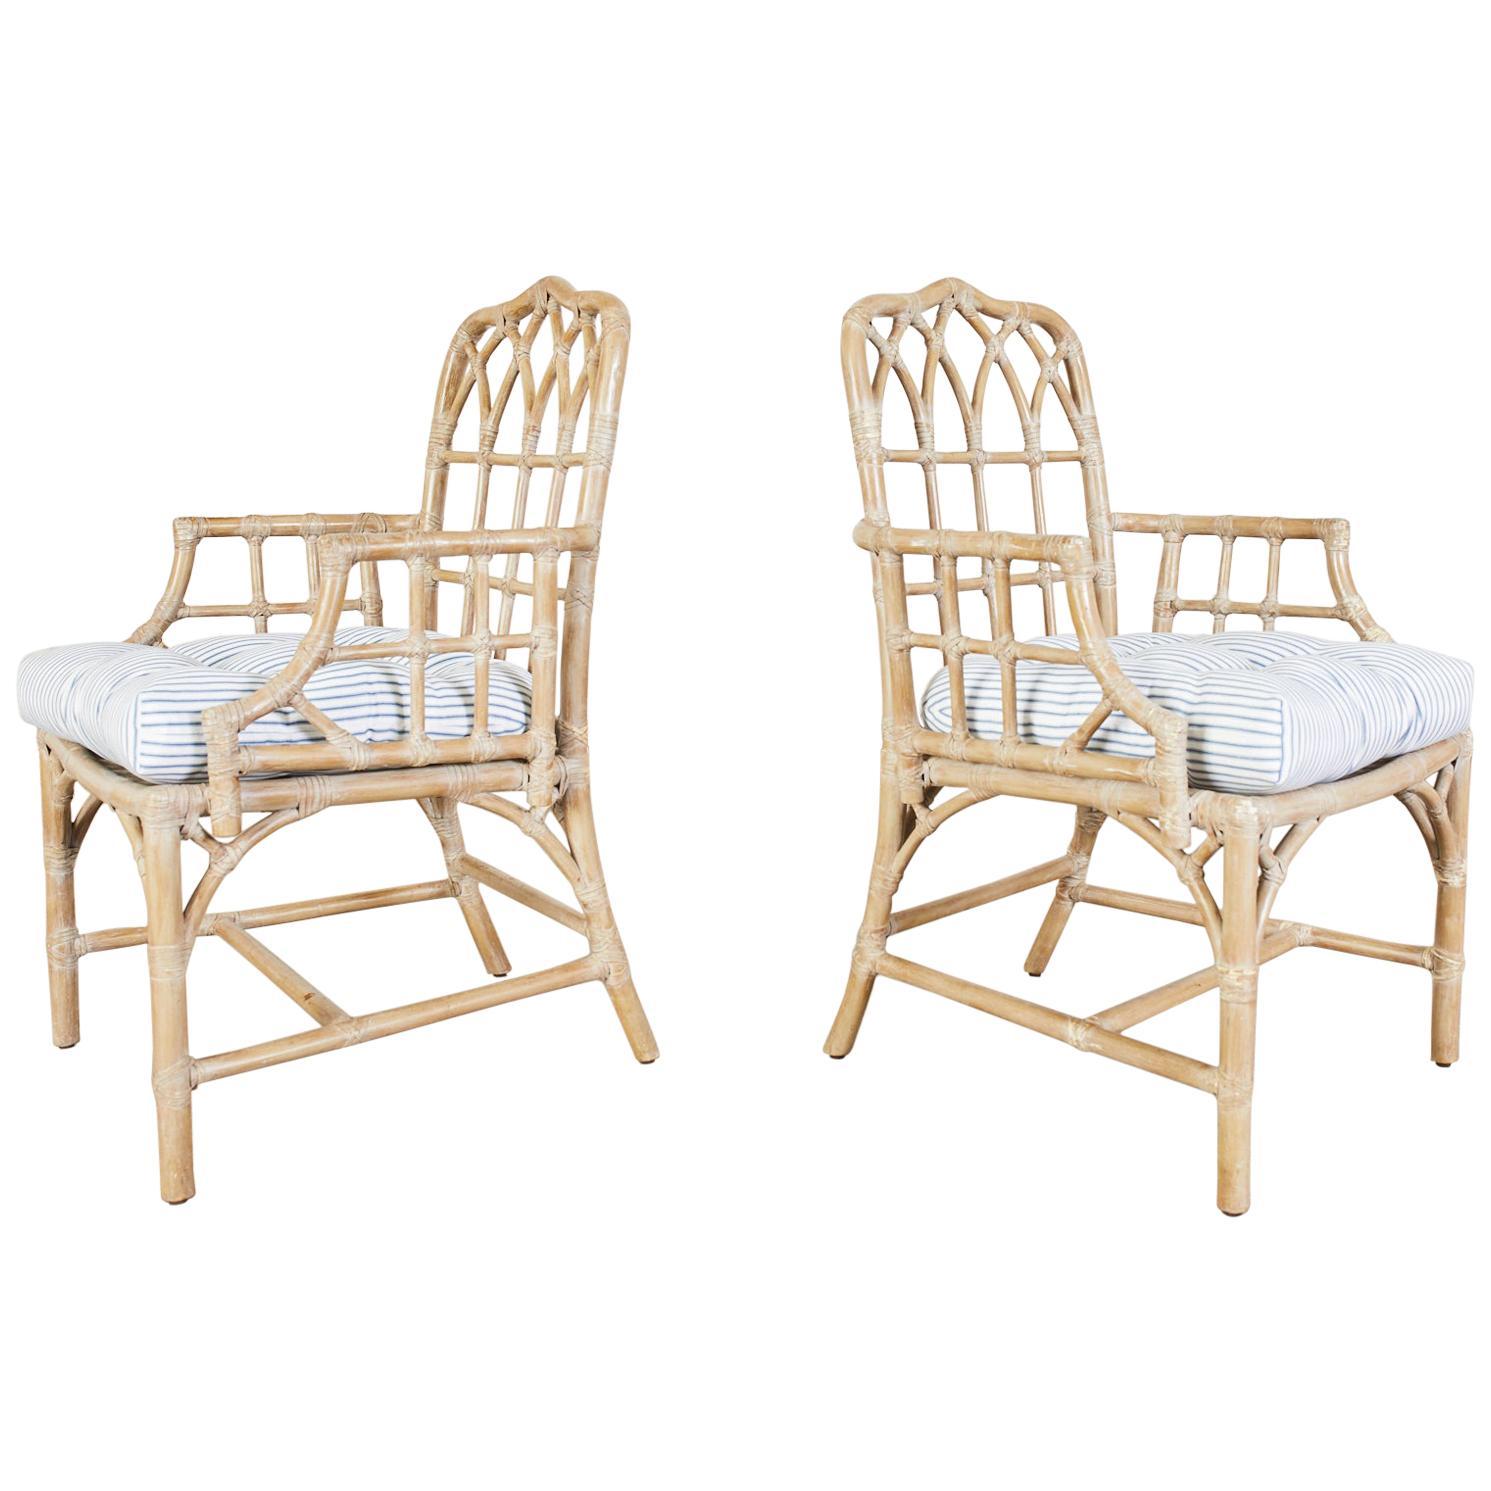 Pair of McGuire Organic Modern Bamboo Rattan Dining Armchairs